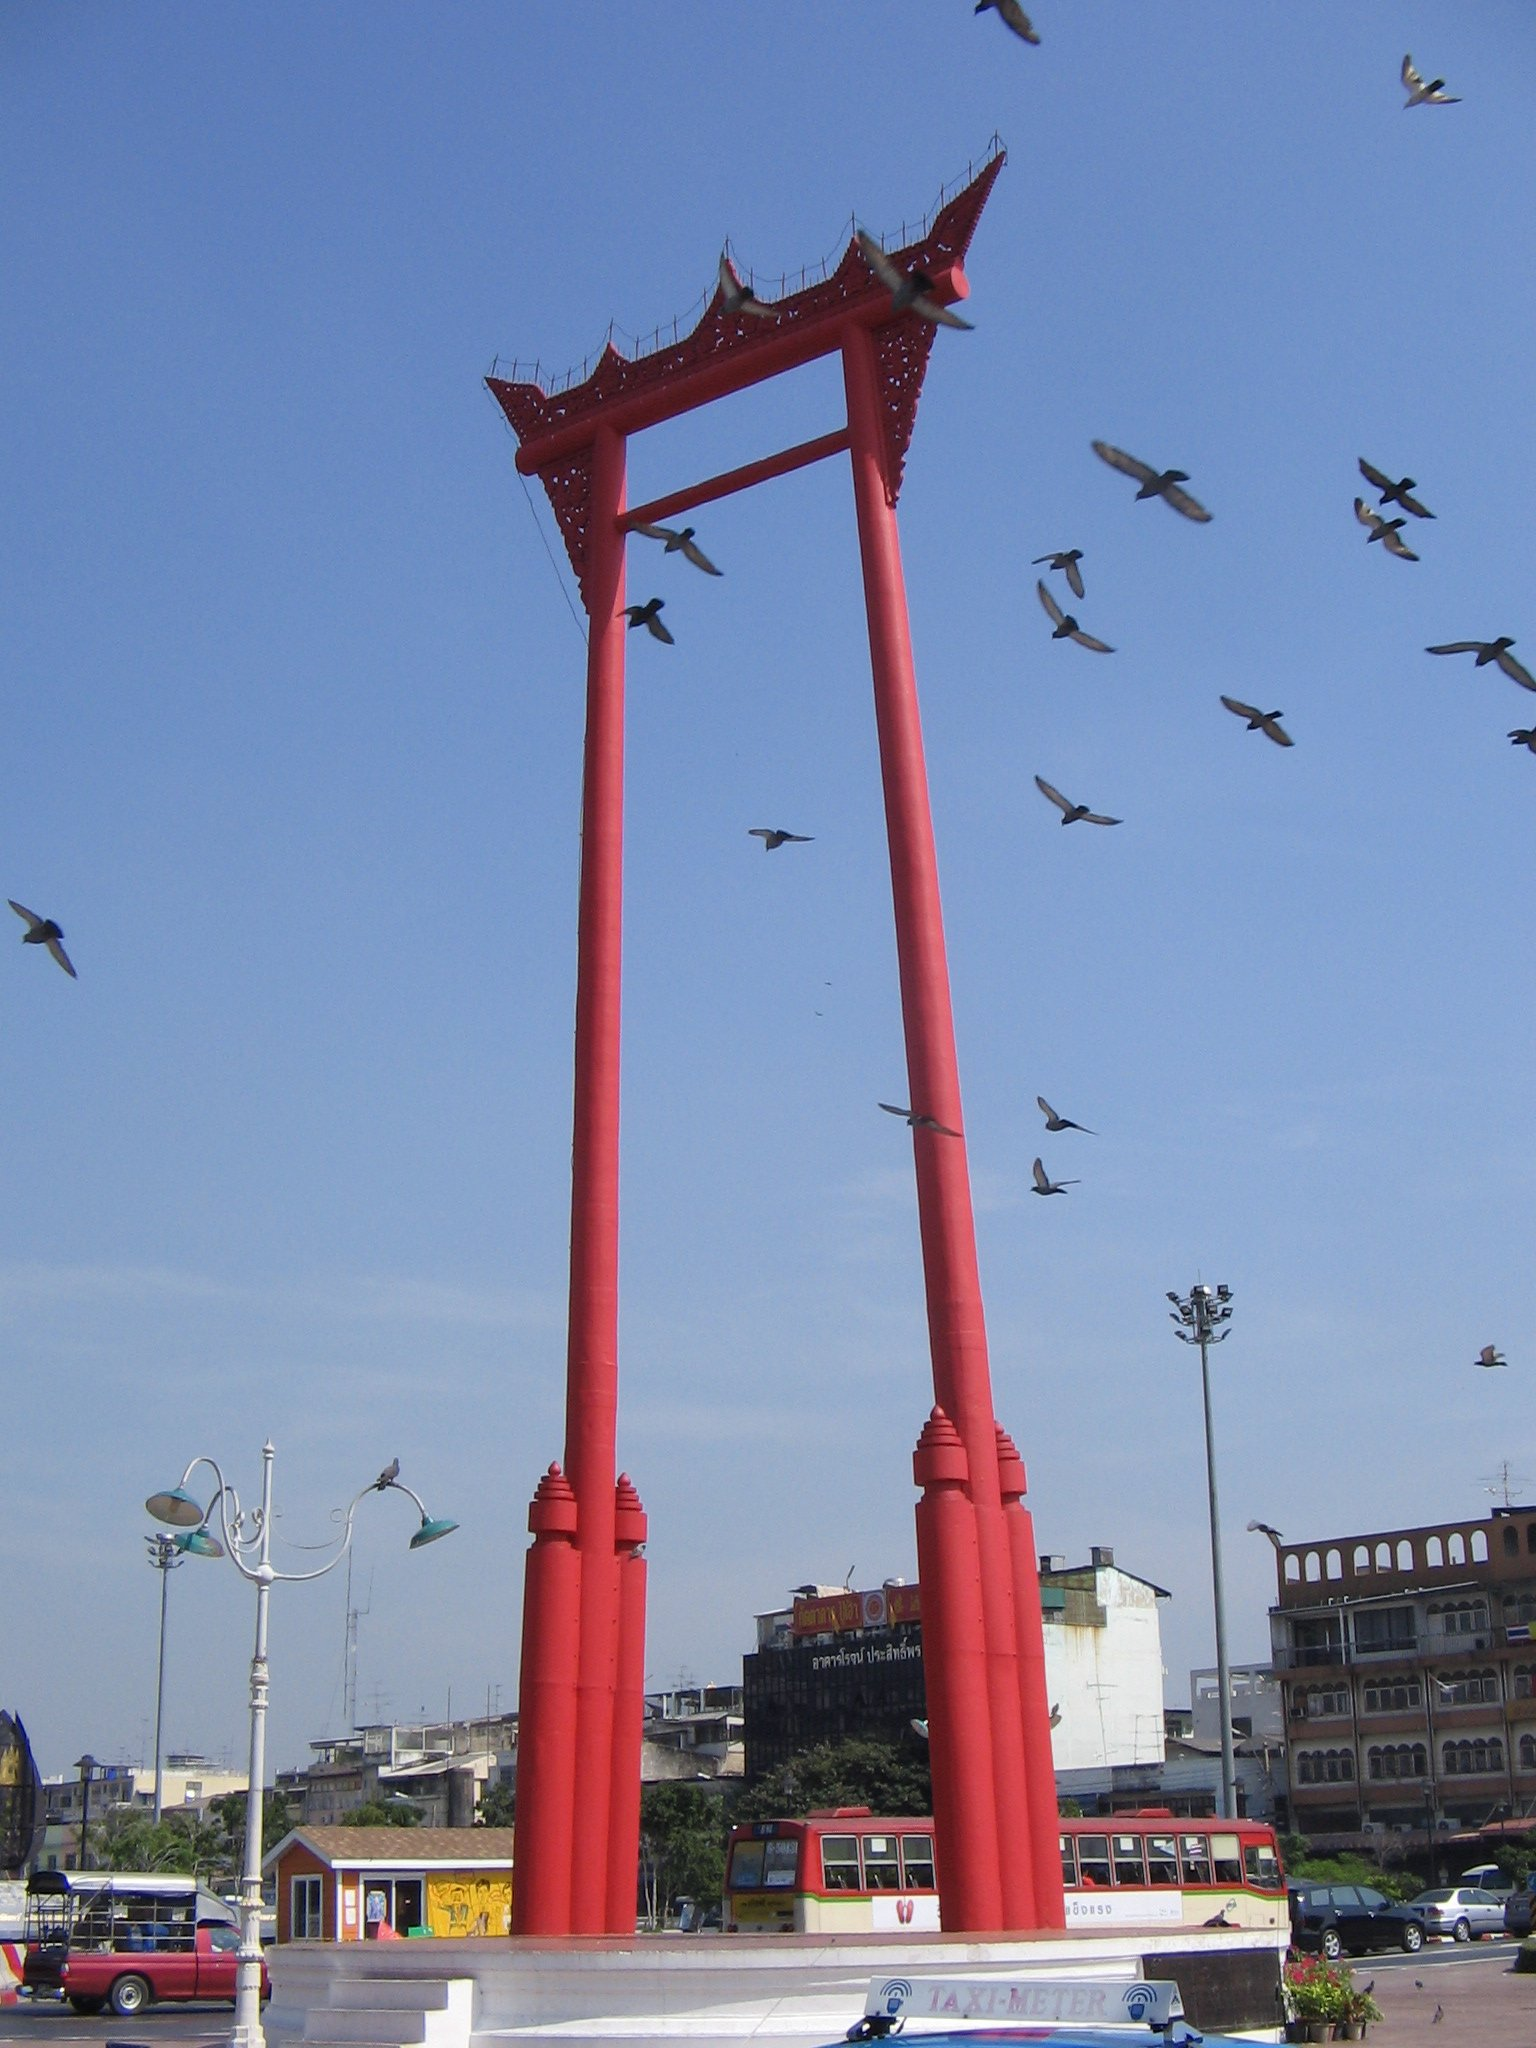 File:Big swing bangkok.JPG